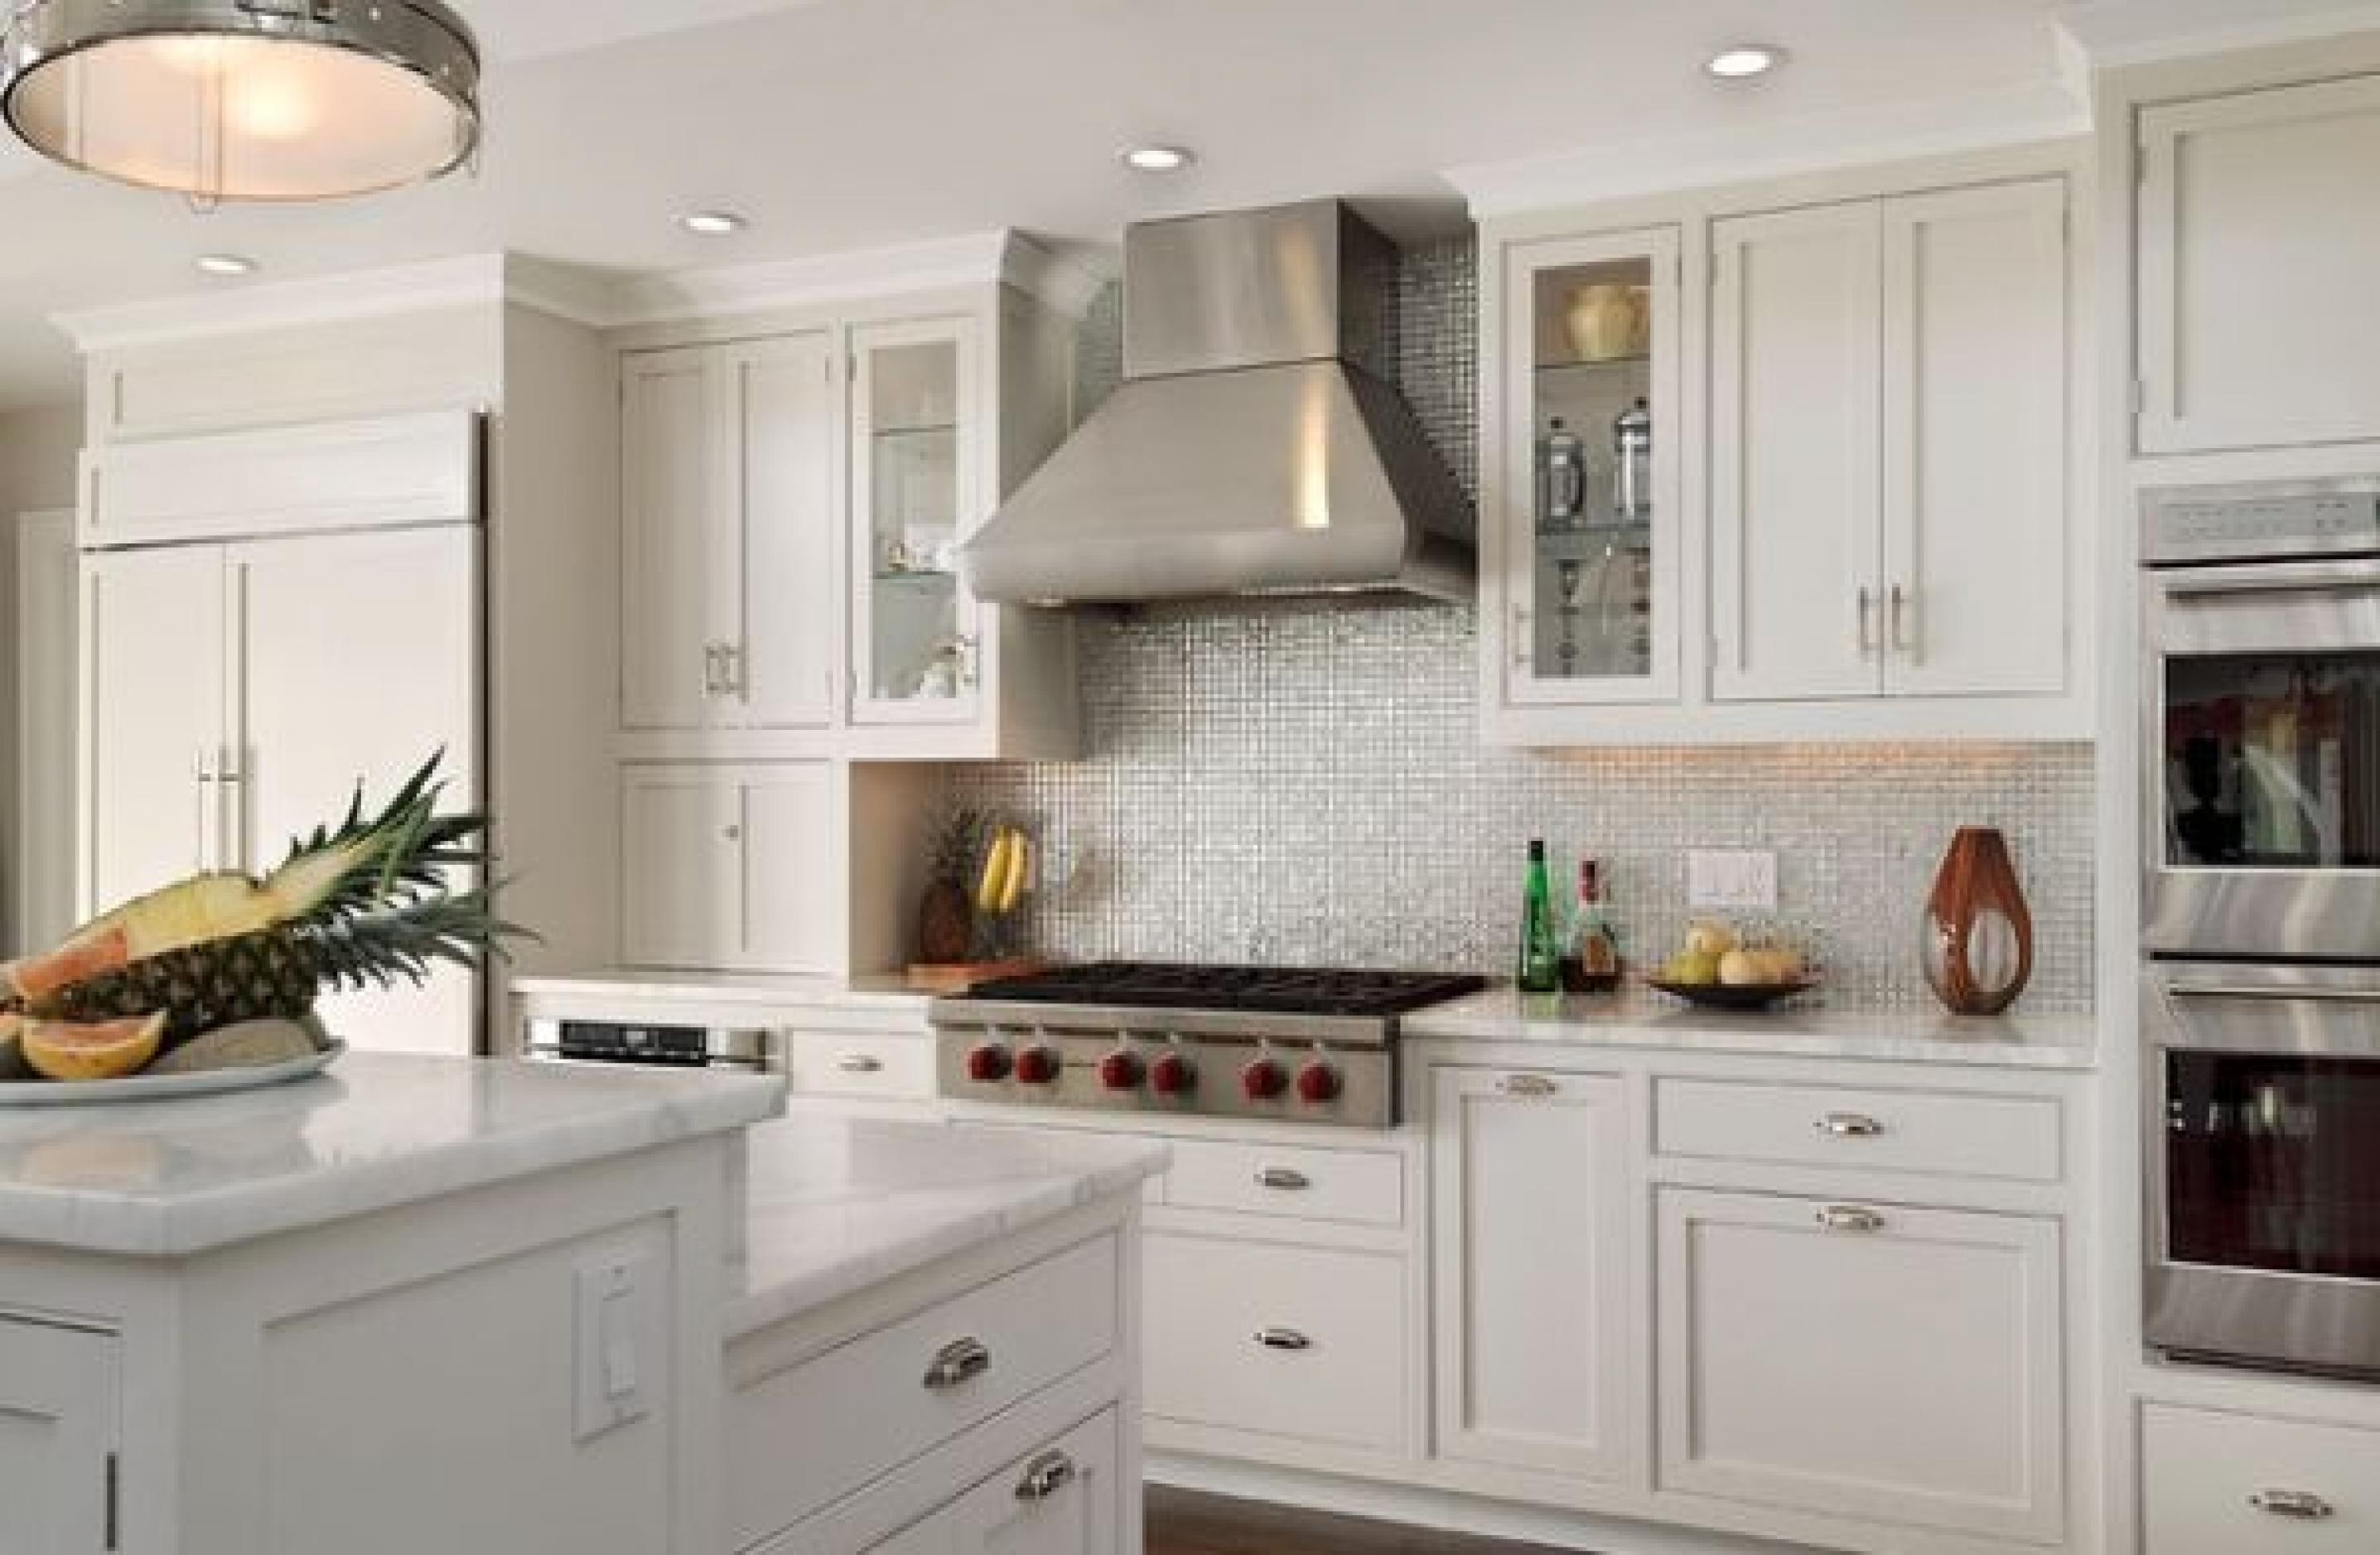 kitchen cabinets backsplash ideas photo - 7